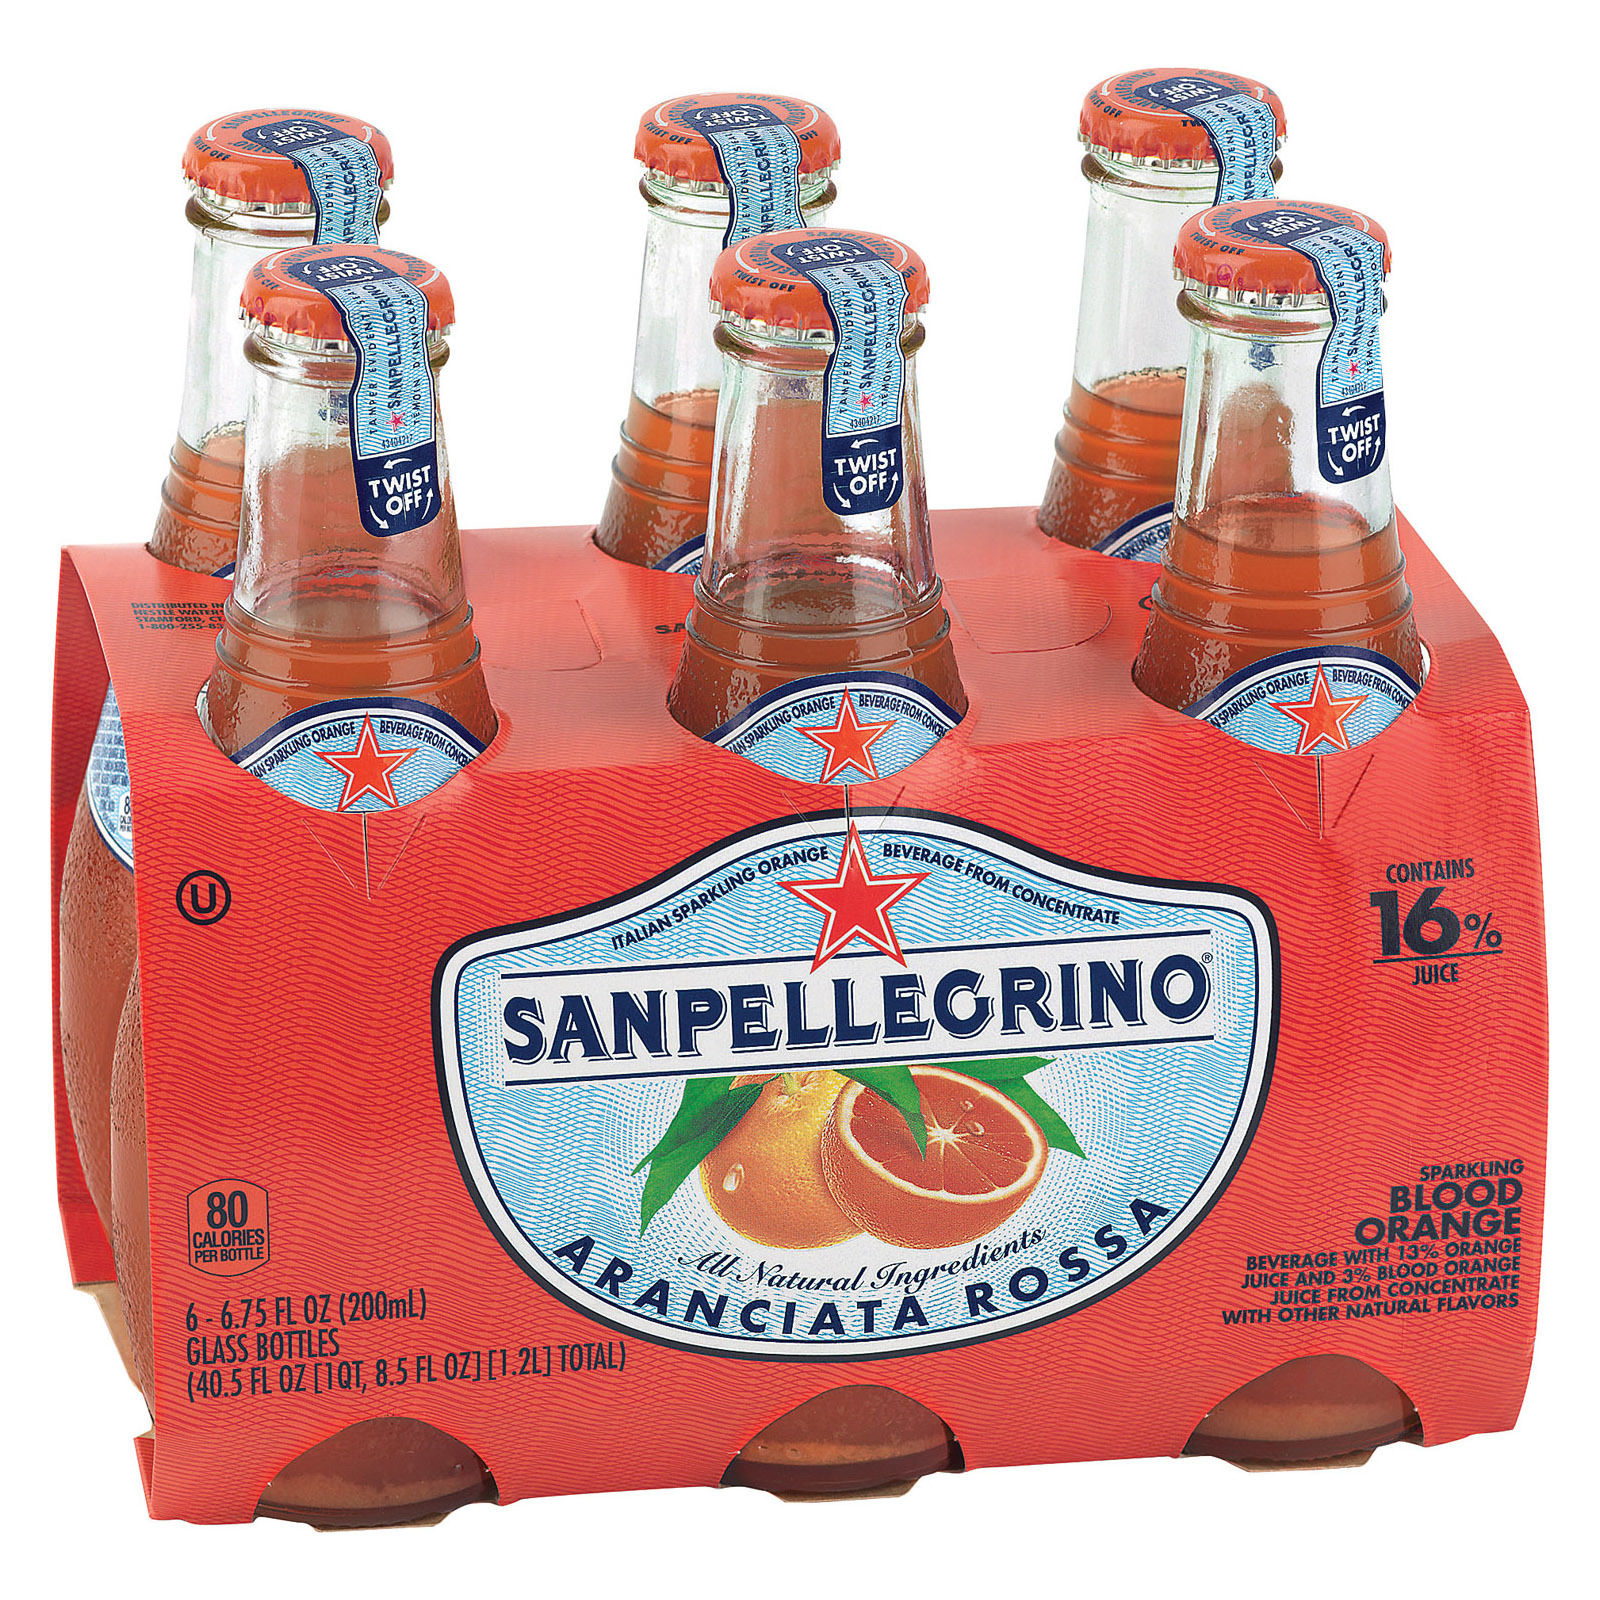 San Pellegrino Sparkling Water - Aranciata Rossa - Case of 4 - 6.75 Fl oz.